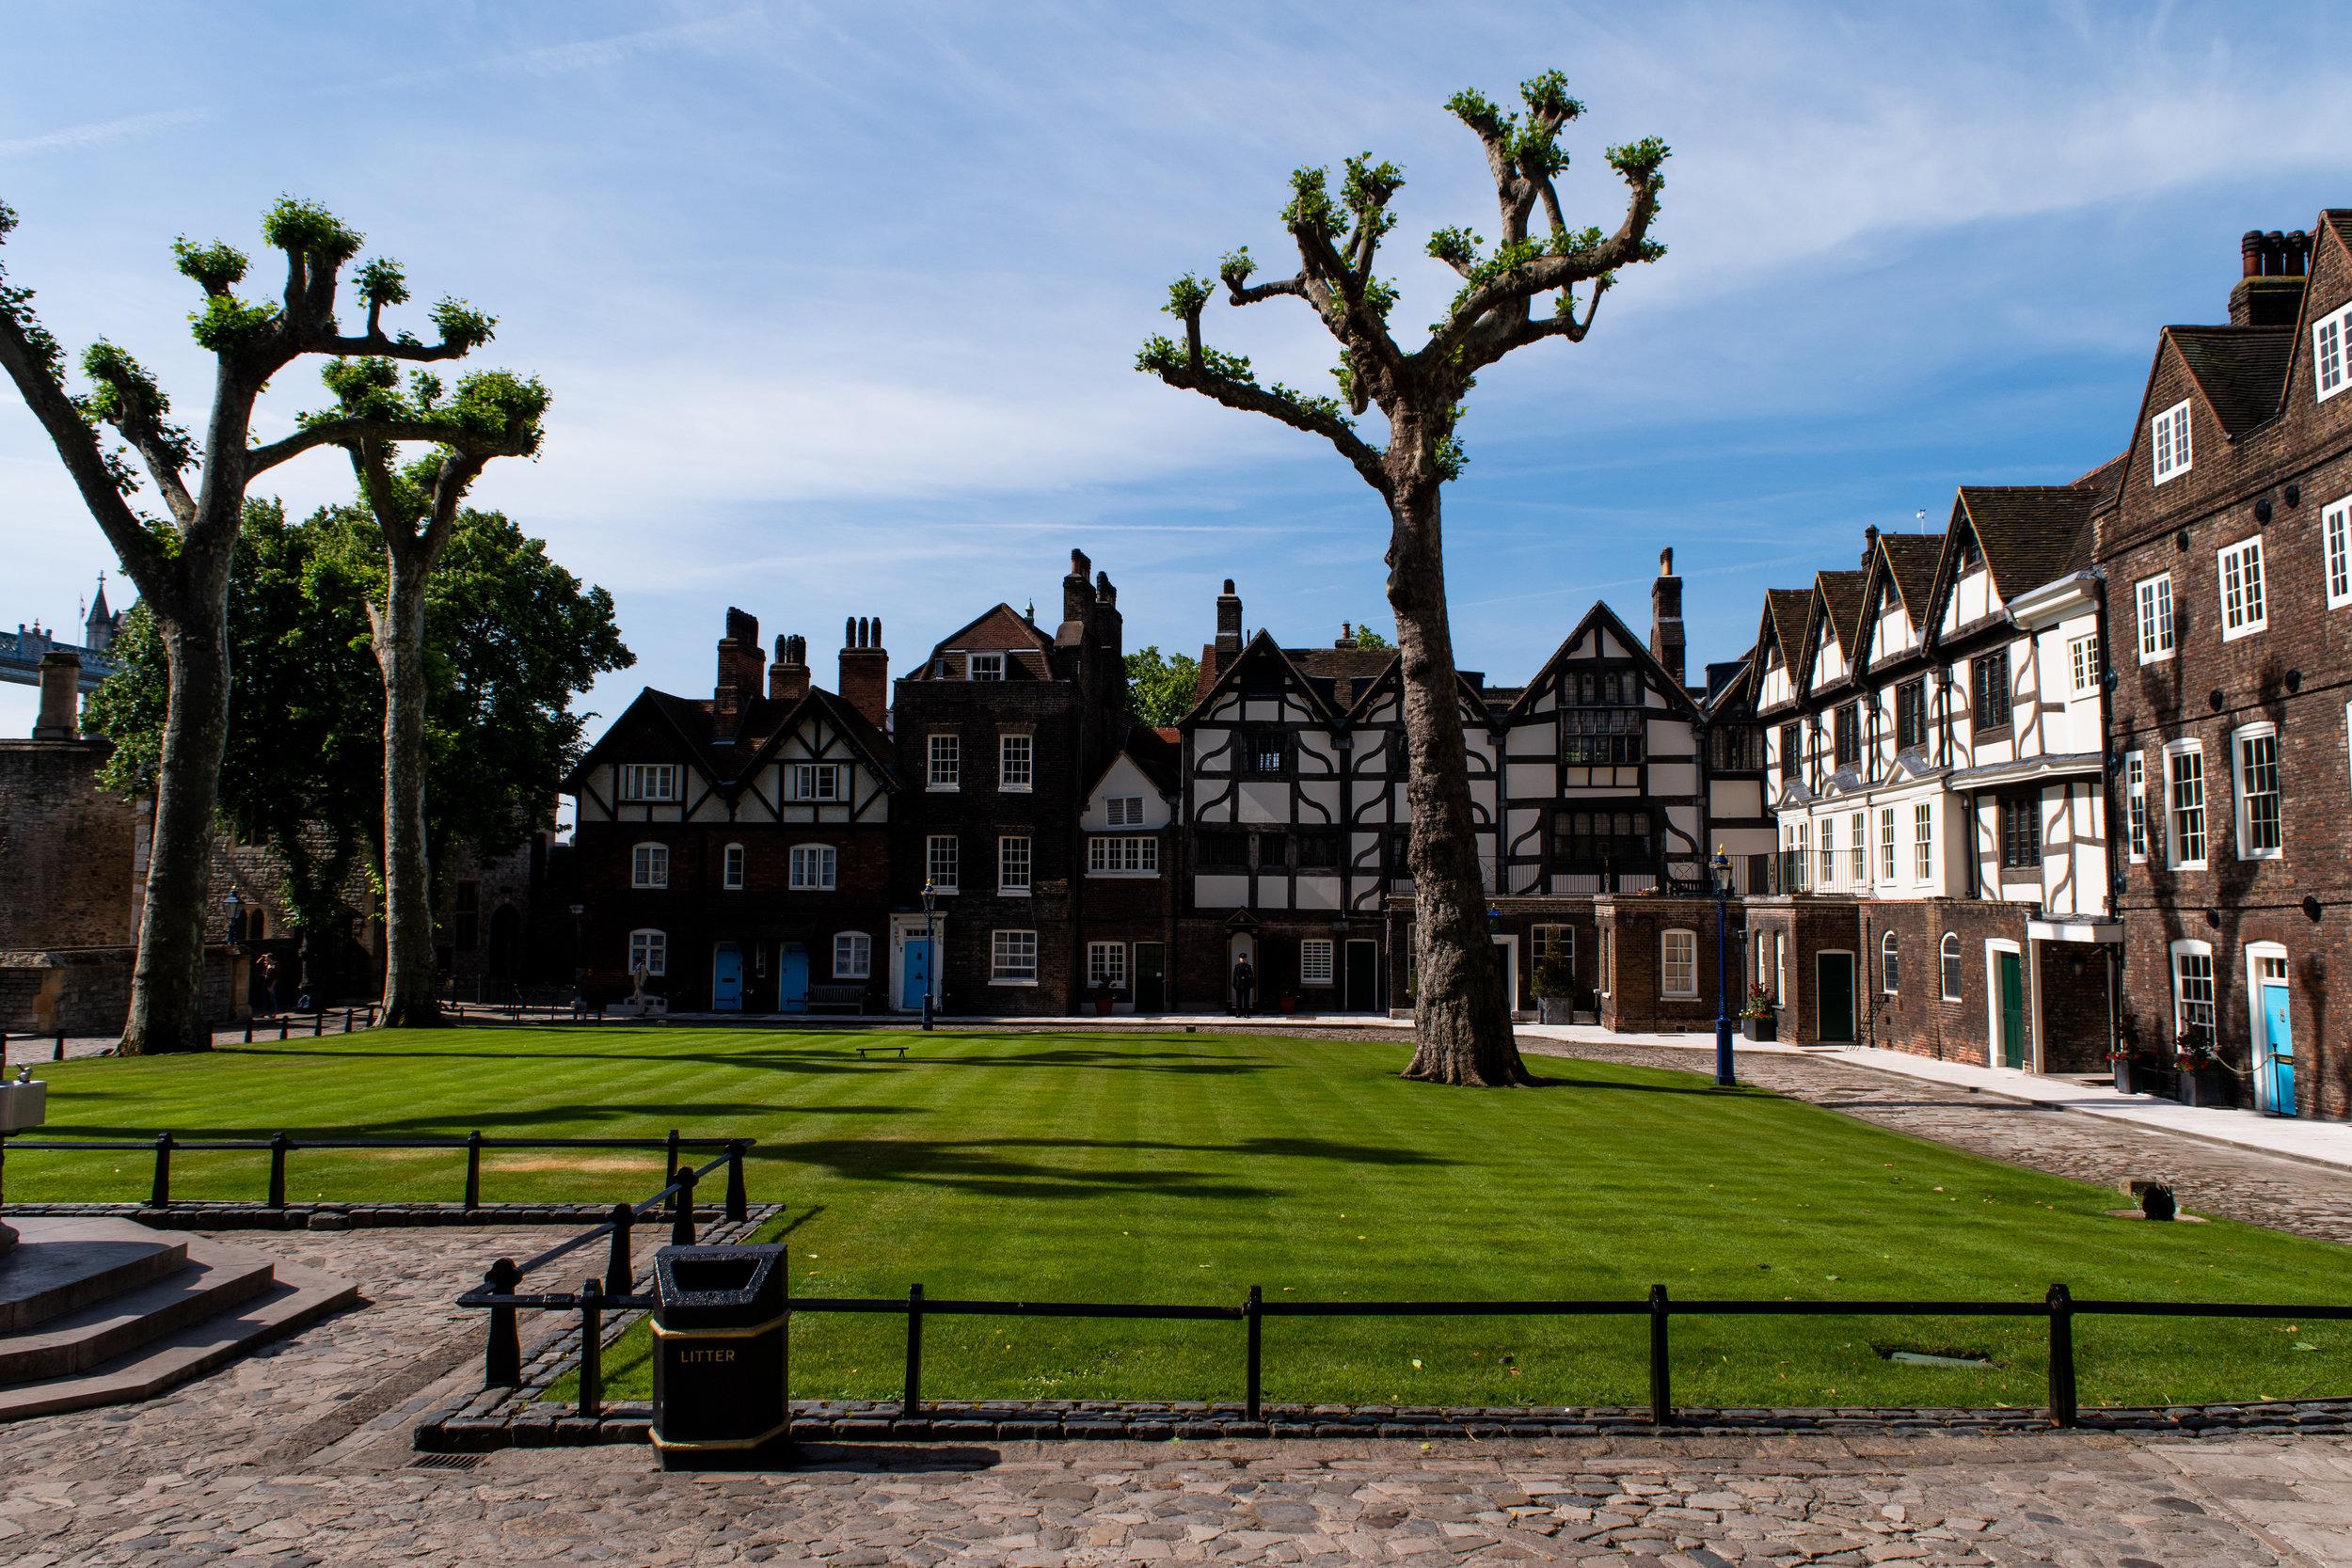 tower of london courtyard jpg.jpg